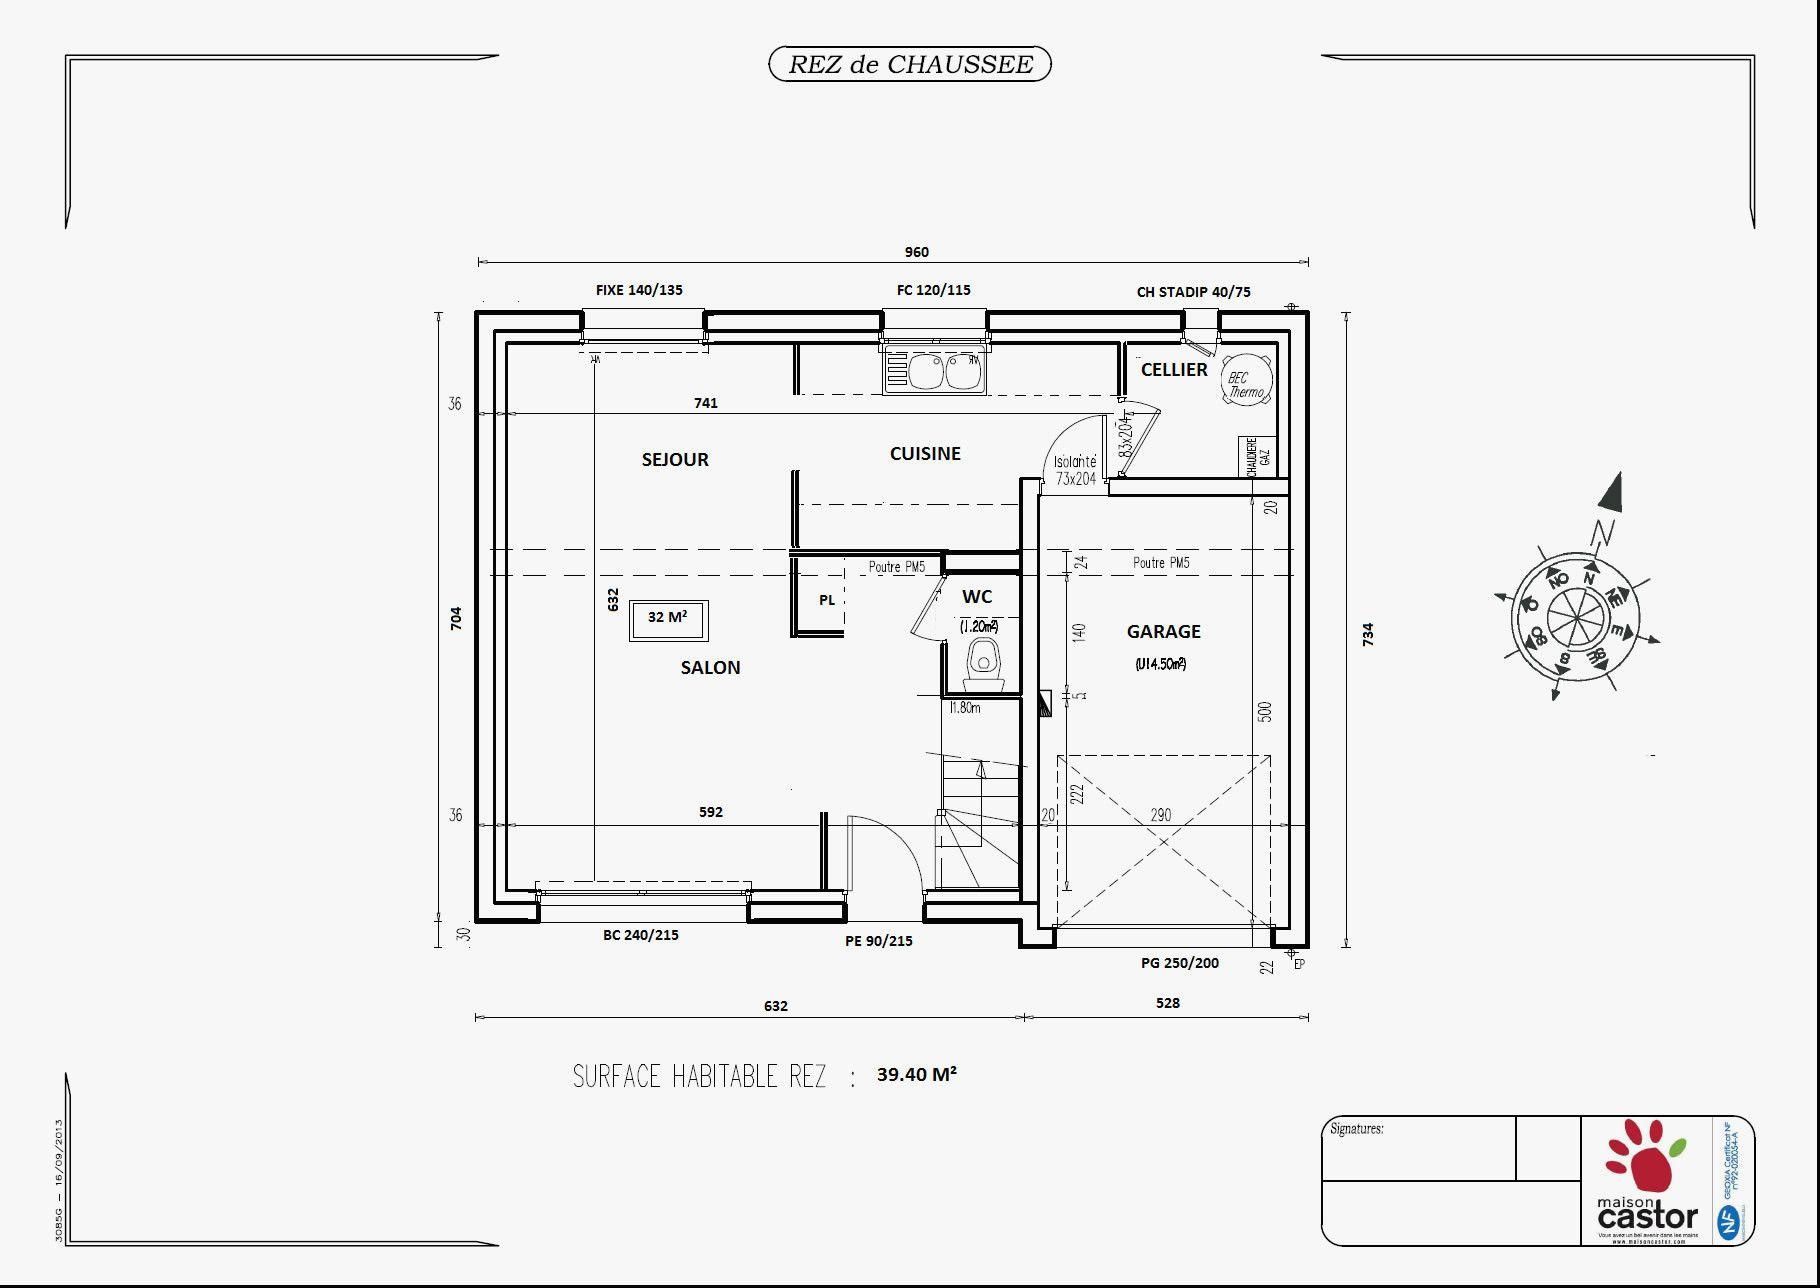 Plan Maison R 1 100m2 Source D Inspiration Plan Maison R 1 28 Images Avis Sur Plan Maison R 1 Of Plan Mais Plan Maison Plan Maison 3 Chambres Plan Maison 100m2